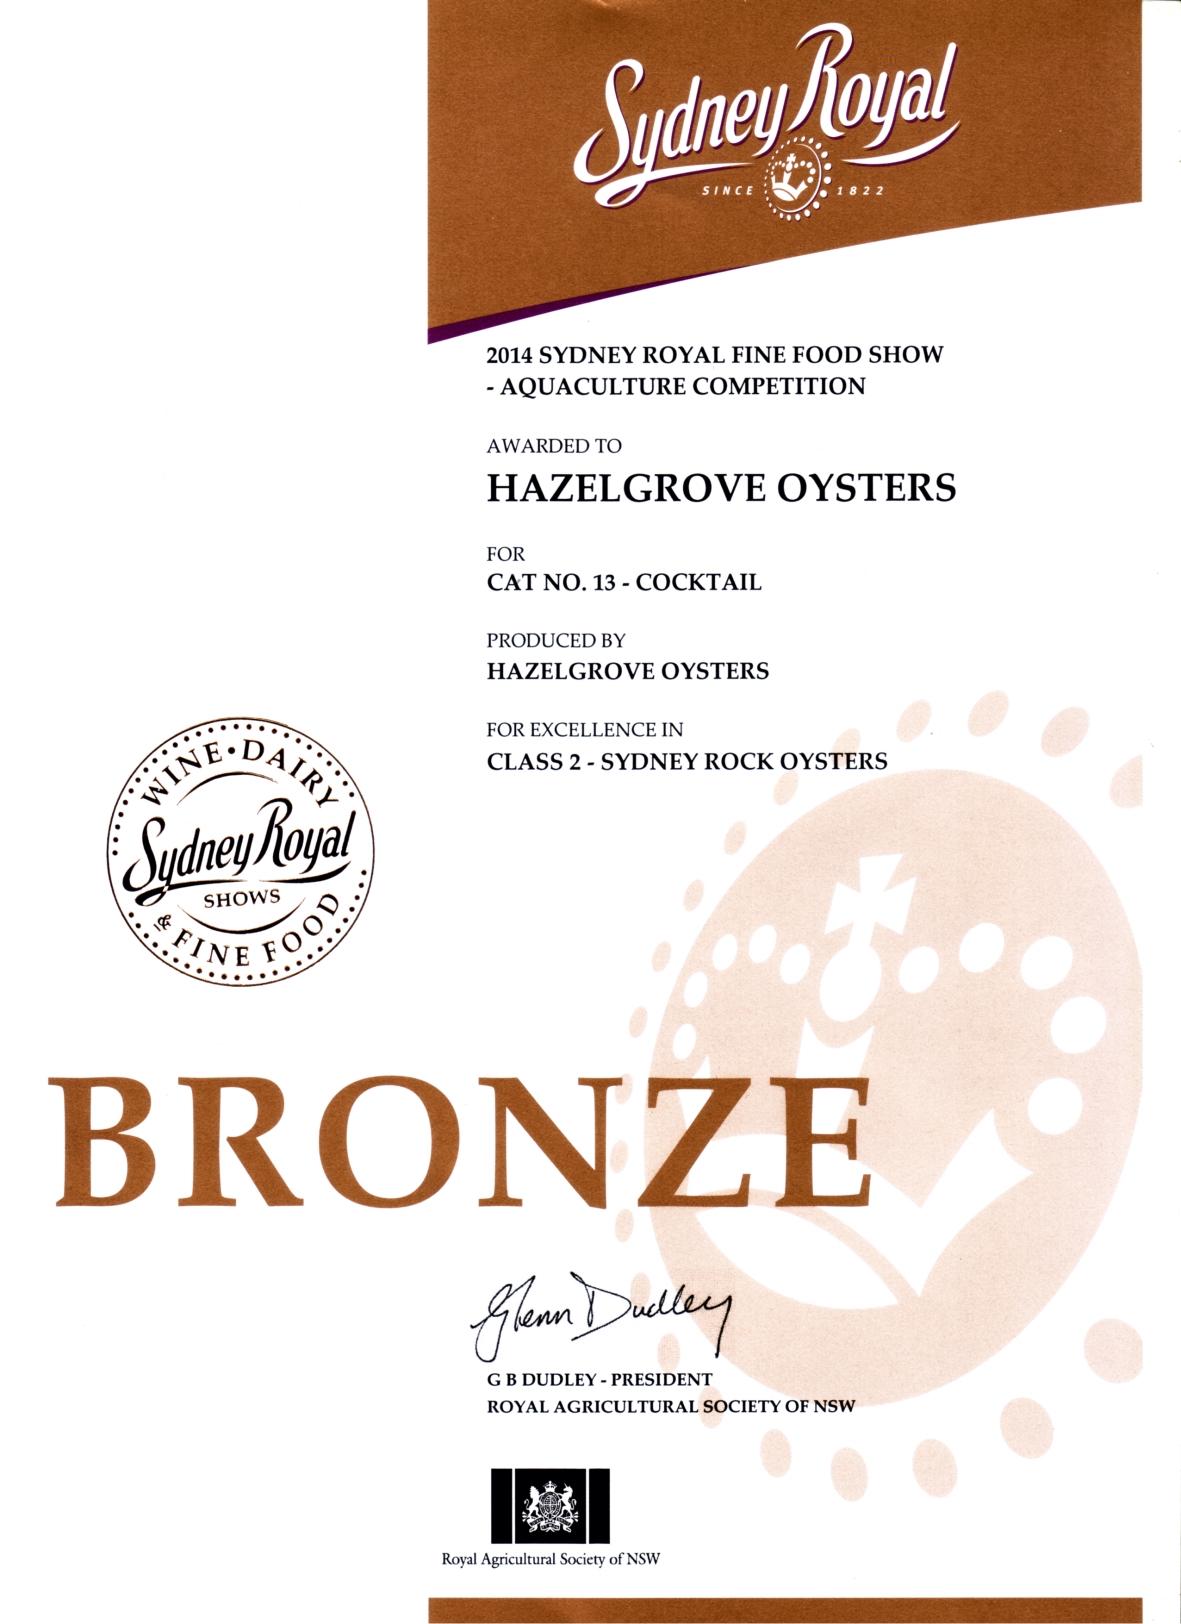 Bronze+2014